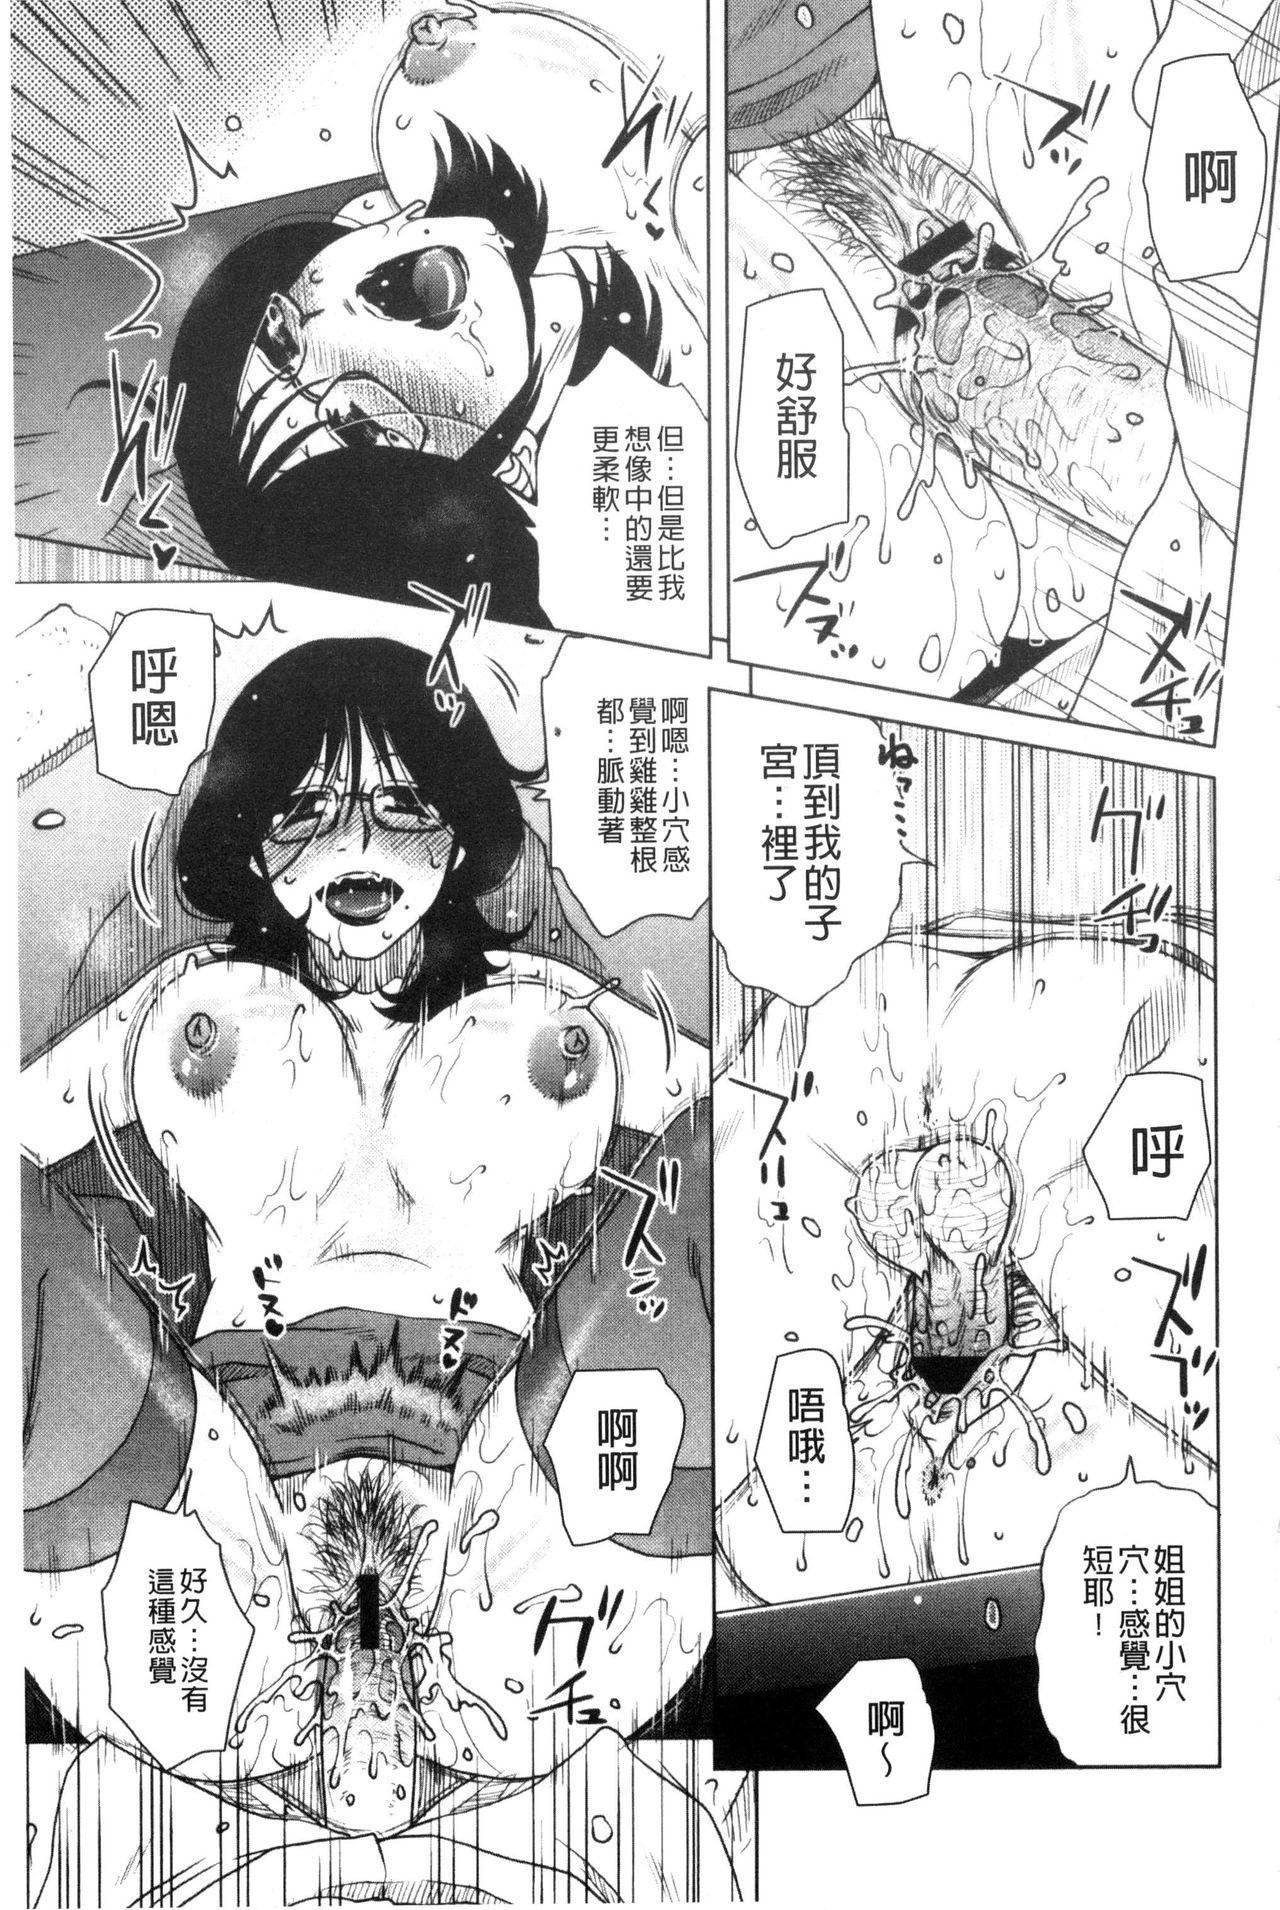 [Kurumiya Mashimin] Uchi no Shachou no Hamedere Inkatsu - Our President is HAME-DERE in Licentious sex life. [Chinese] 59